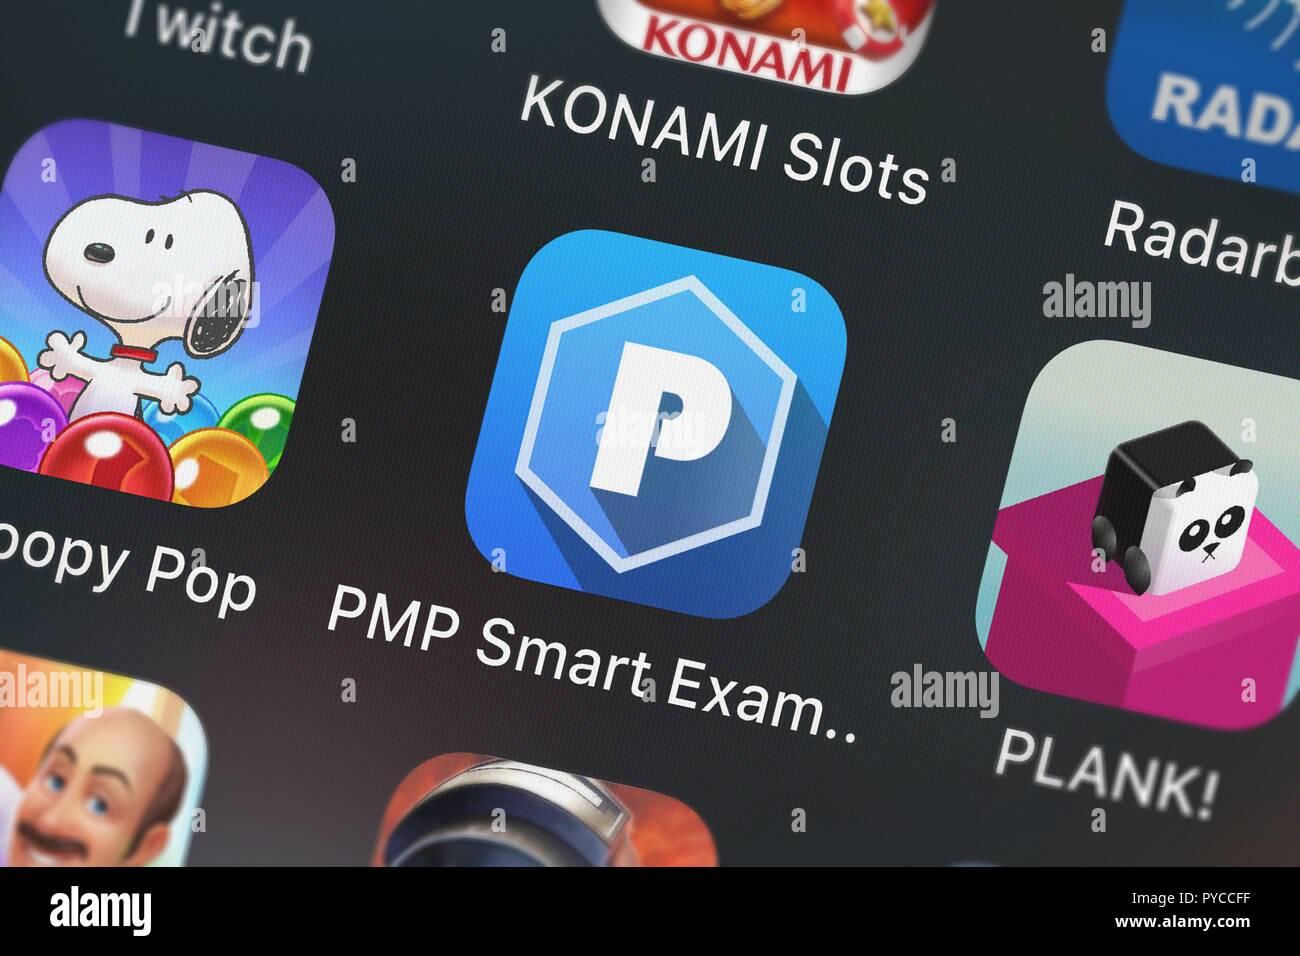 Exam Prep Stock Photos & Exam Prep Stock Images - Alamy